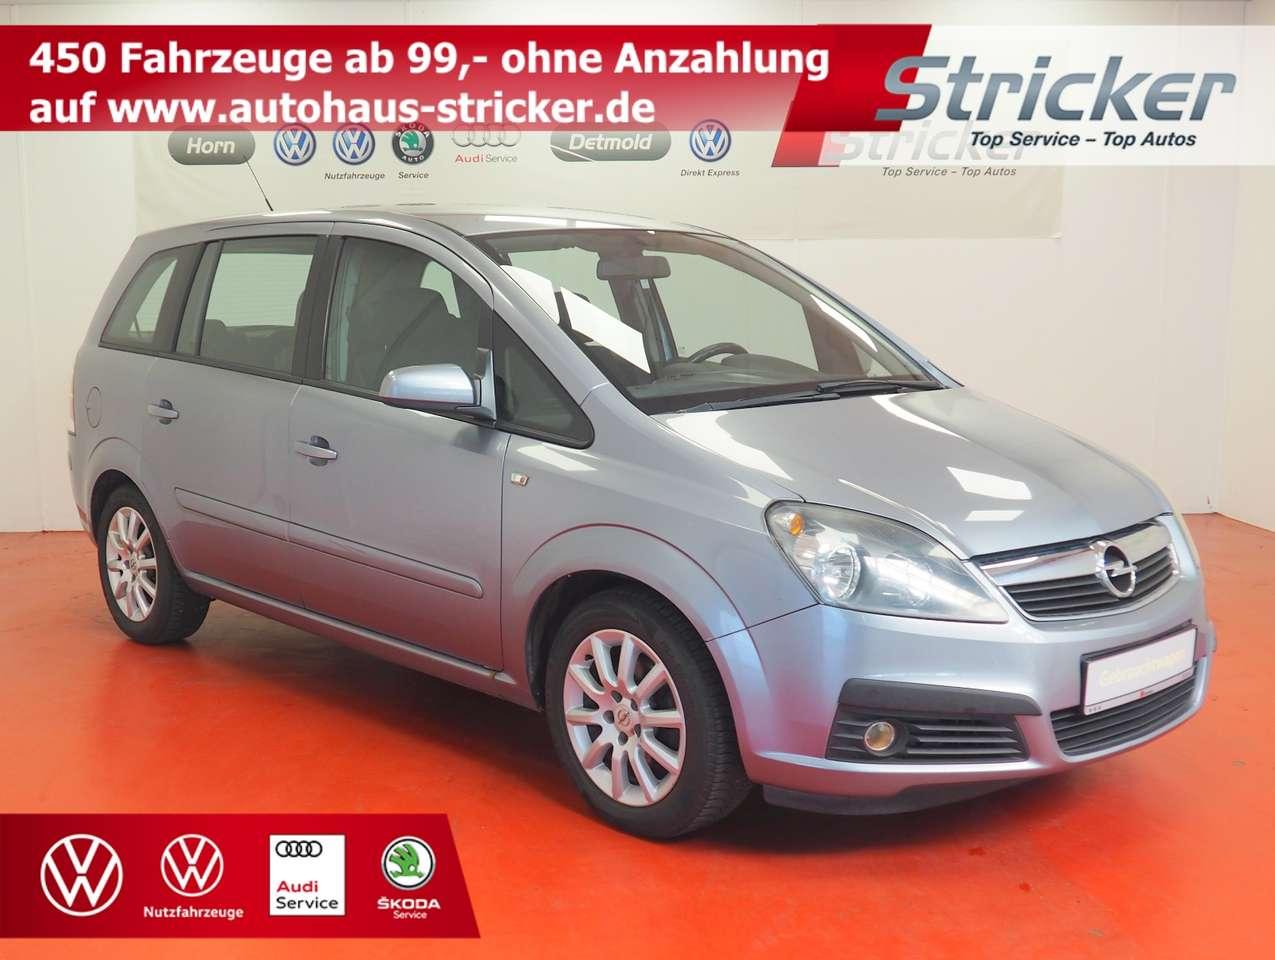 Autos nach Opel Zafira 1.6